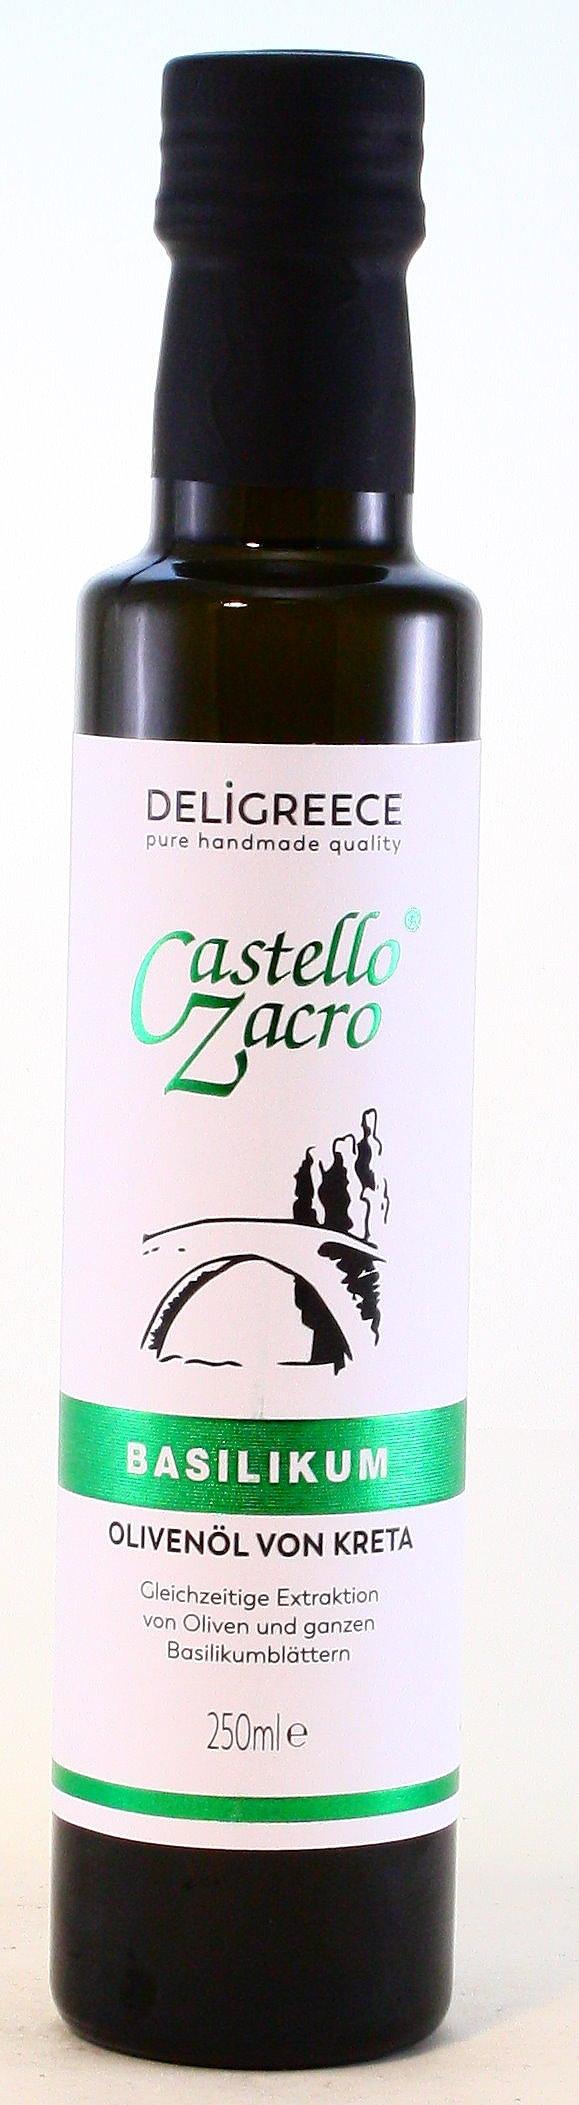 Olivenöl Basilikum, Castello Zacro